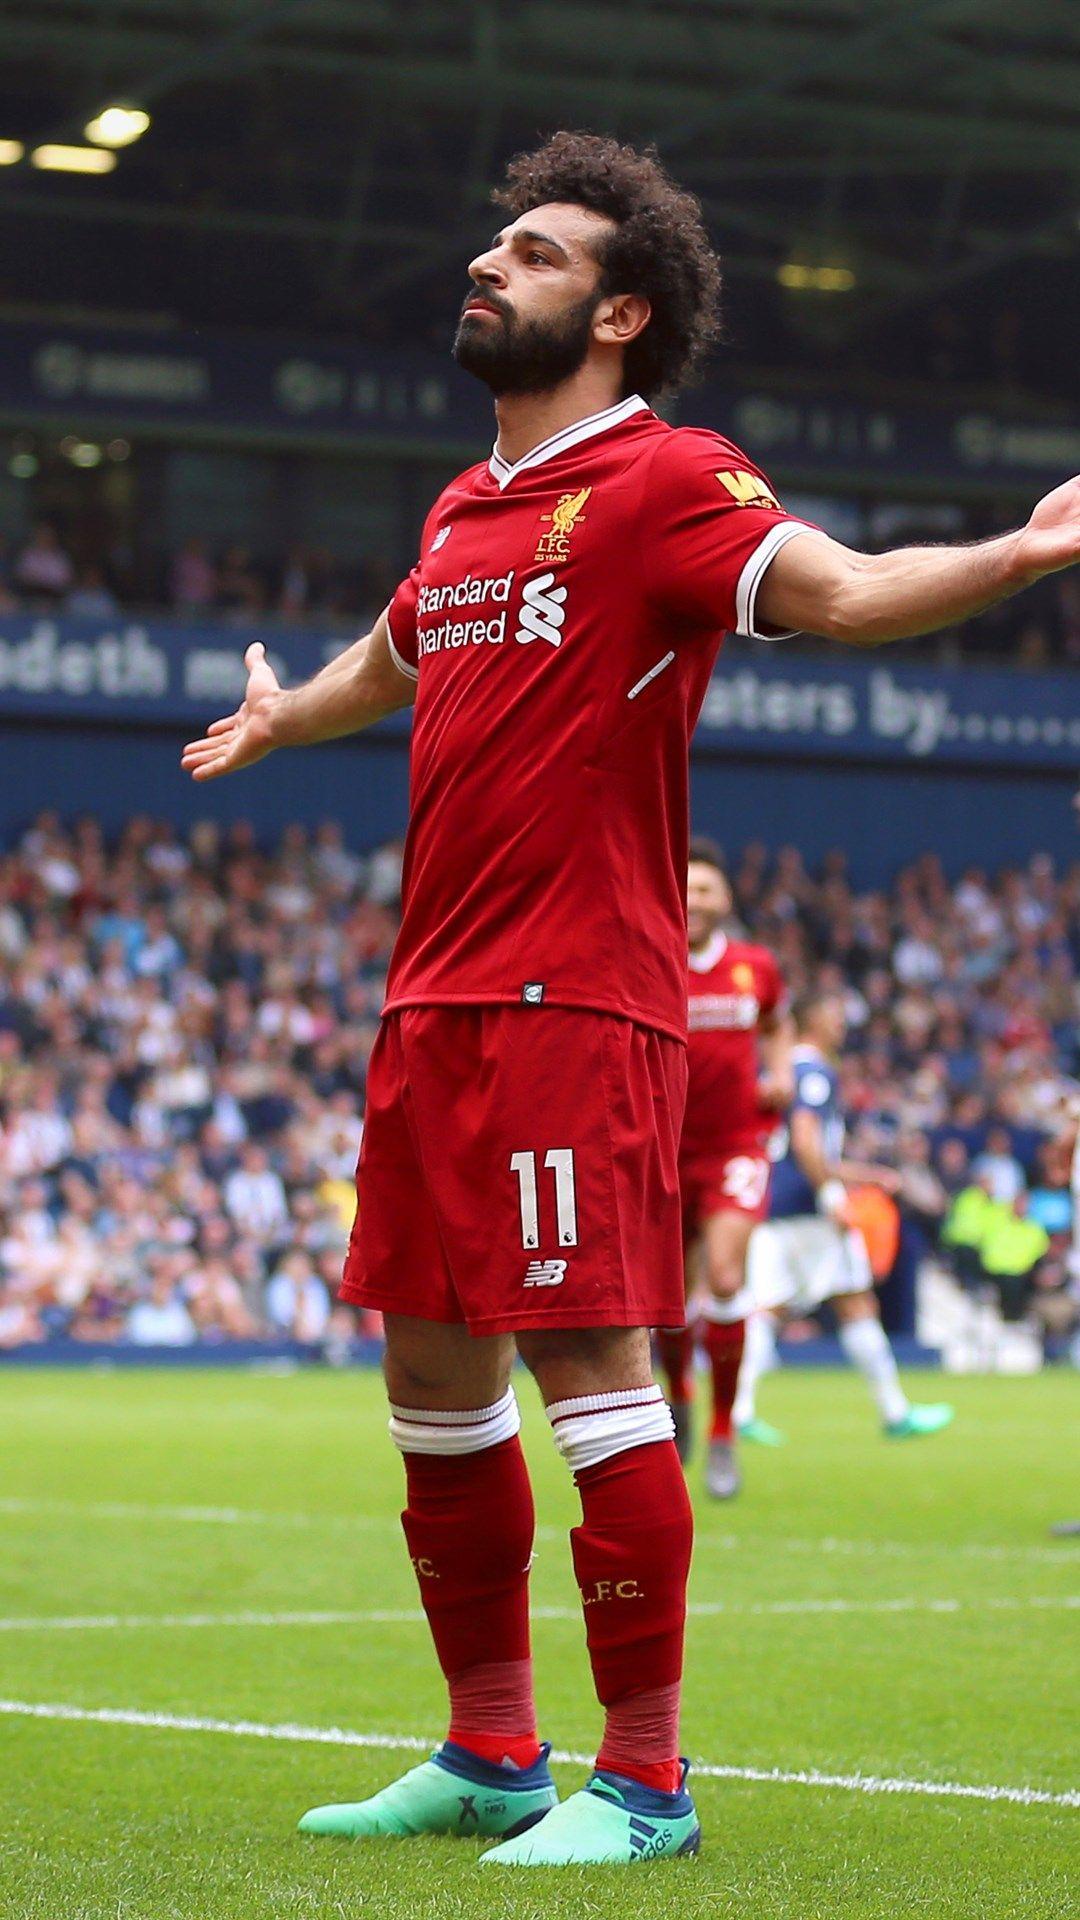 4k Mohamed Salah Match Goal Liverpool Football Stars Premier League Mo Salah Soccer Liverpool Football Club Players Liverpool Players Liverpool Soccer